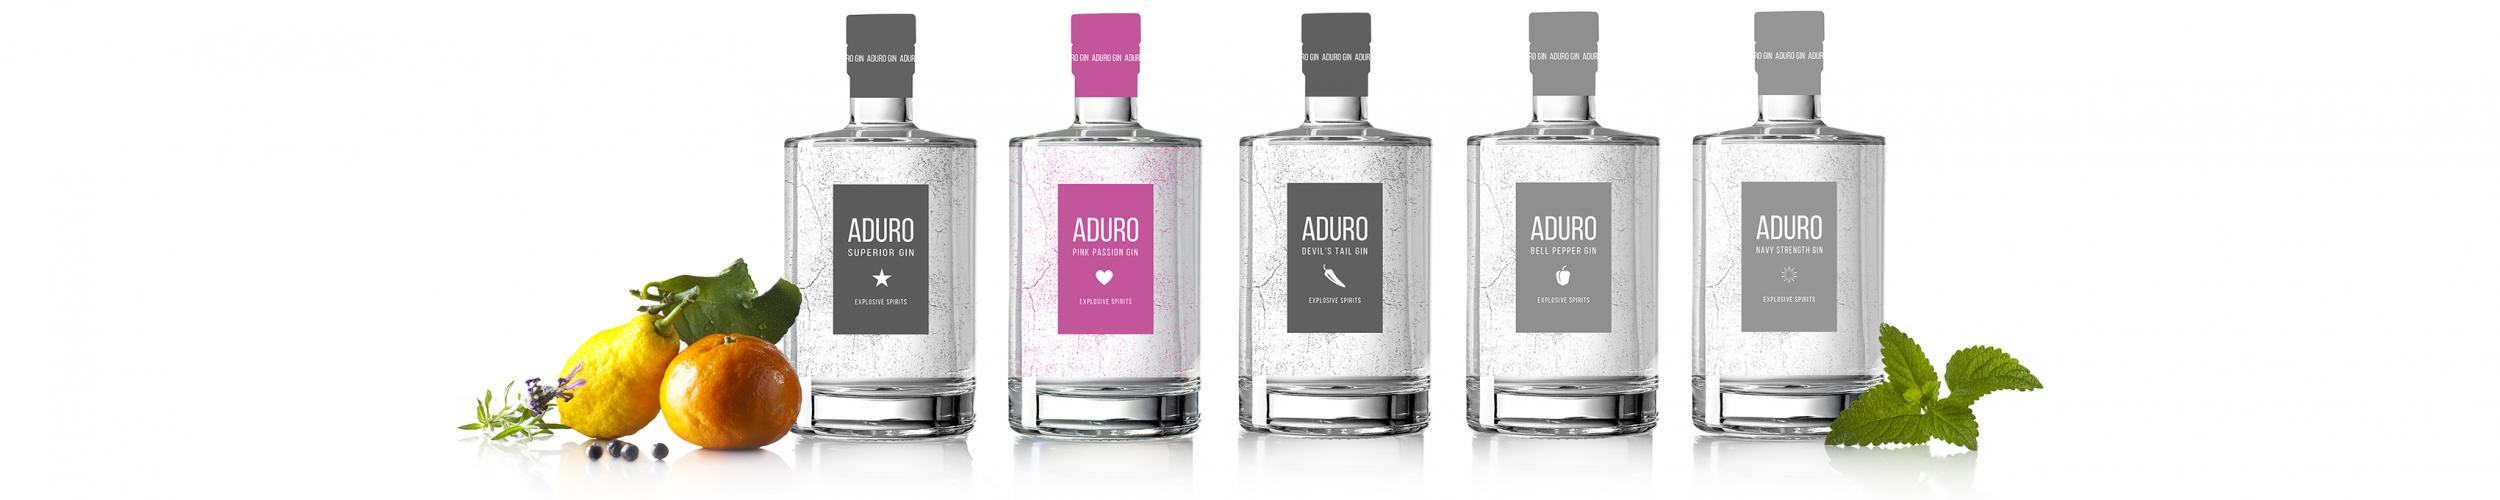 ADURO Pink Passion